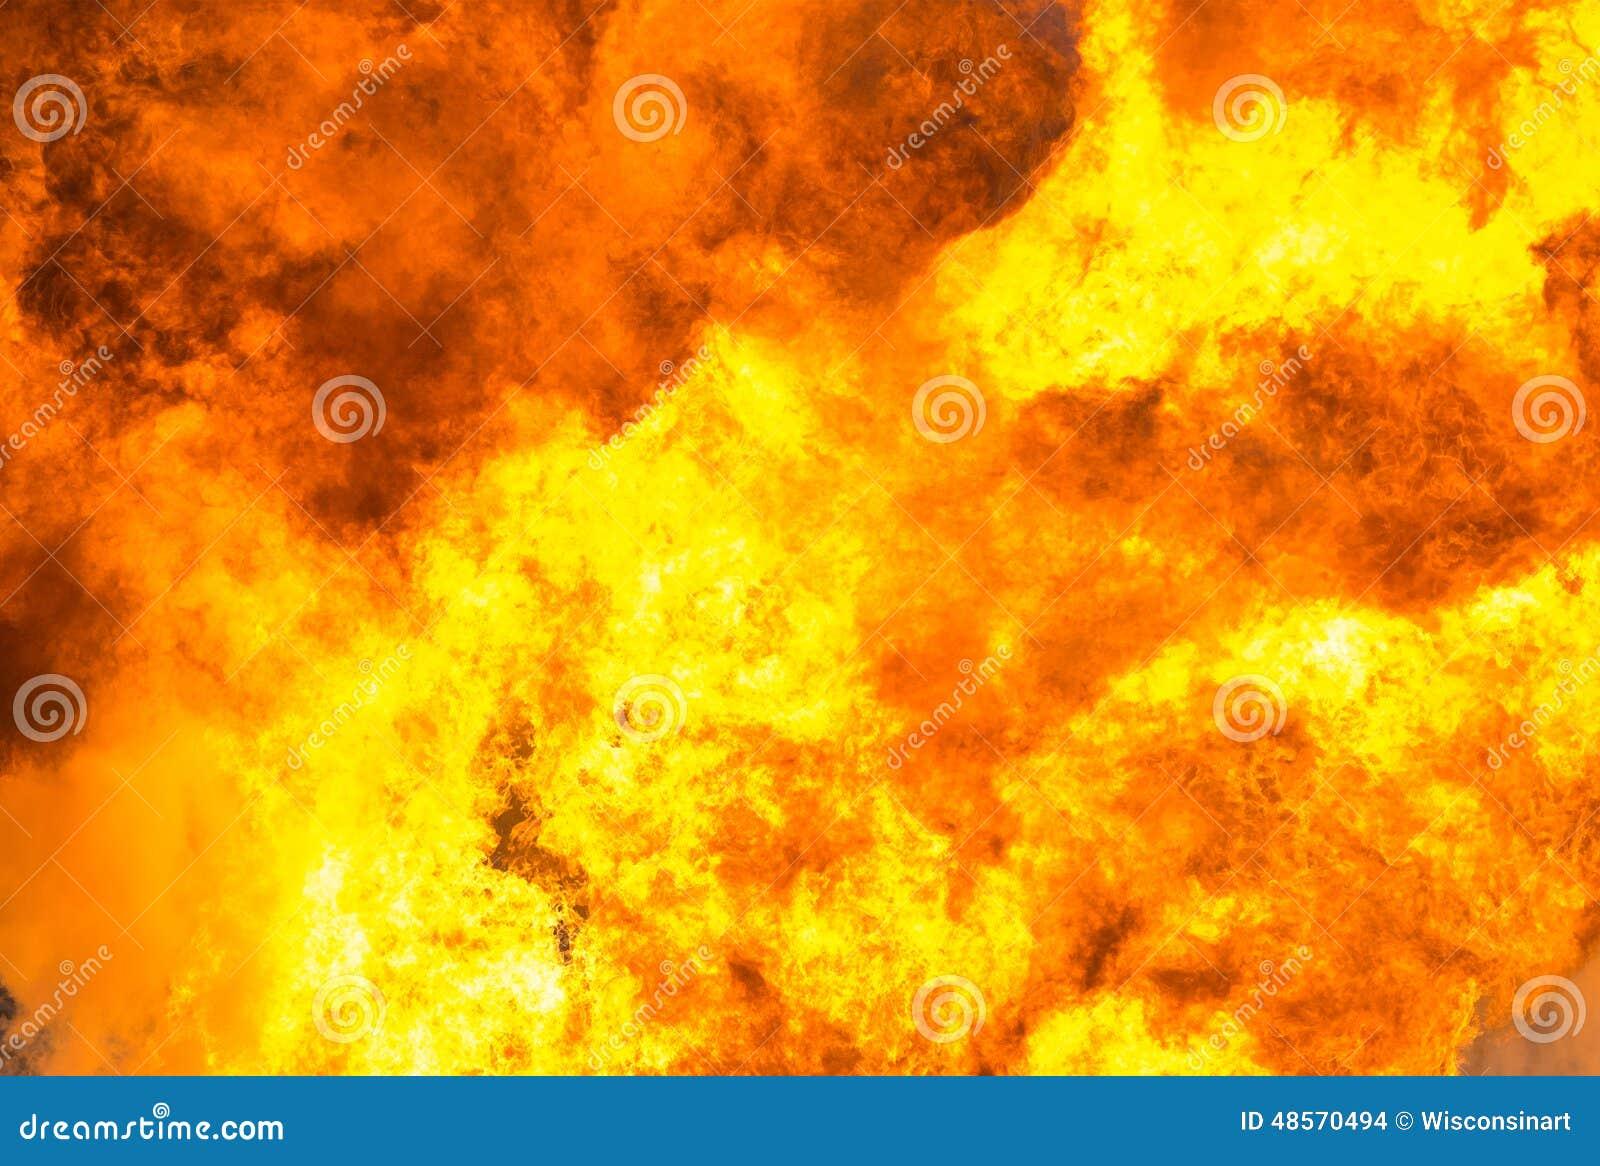 Firey Backgrounds